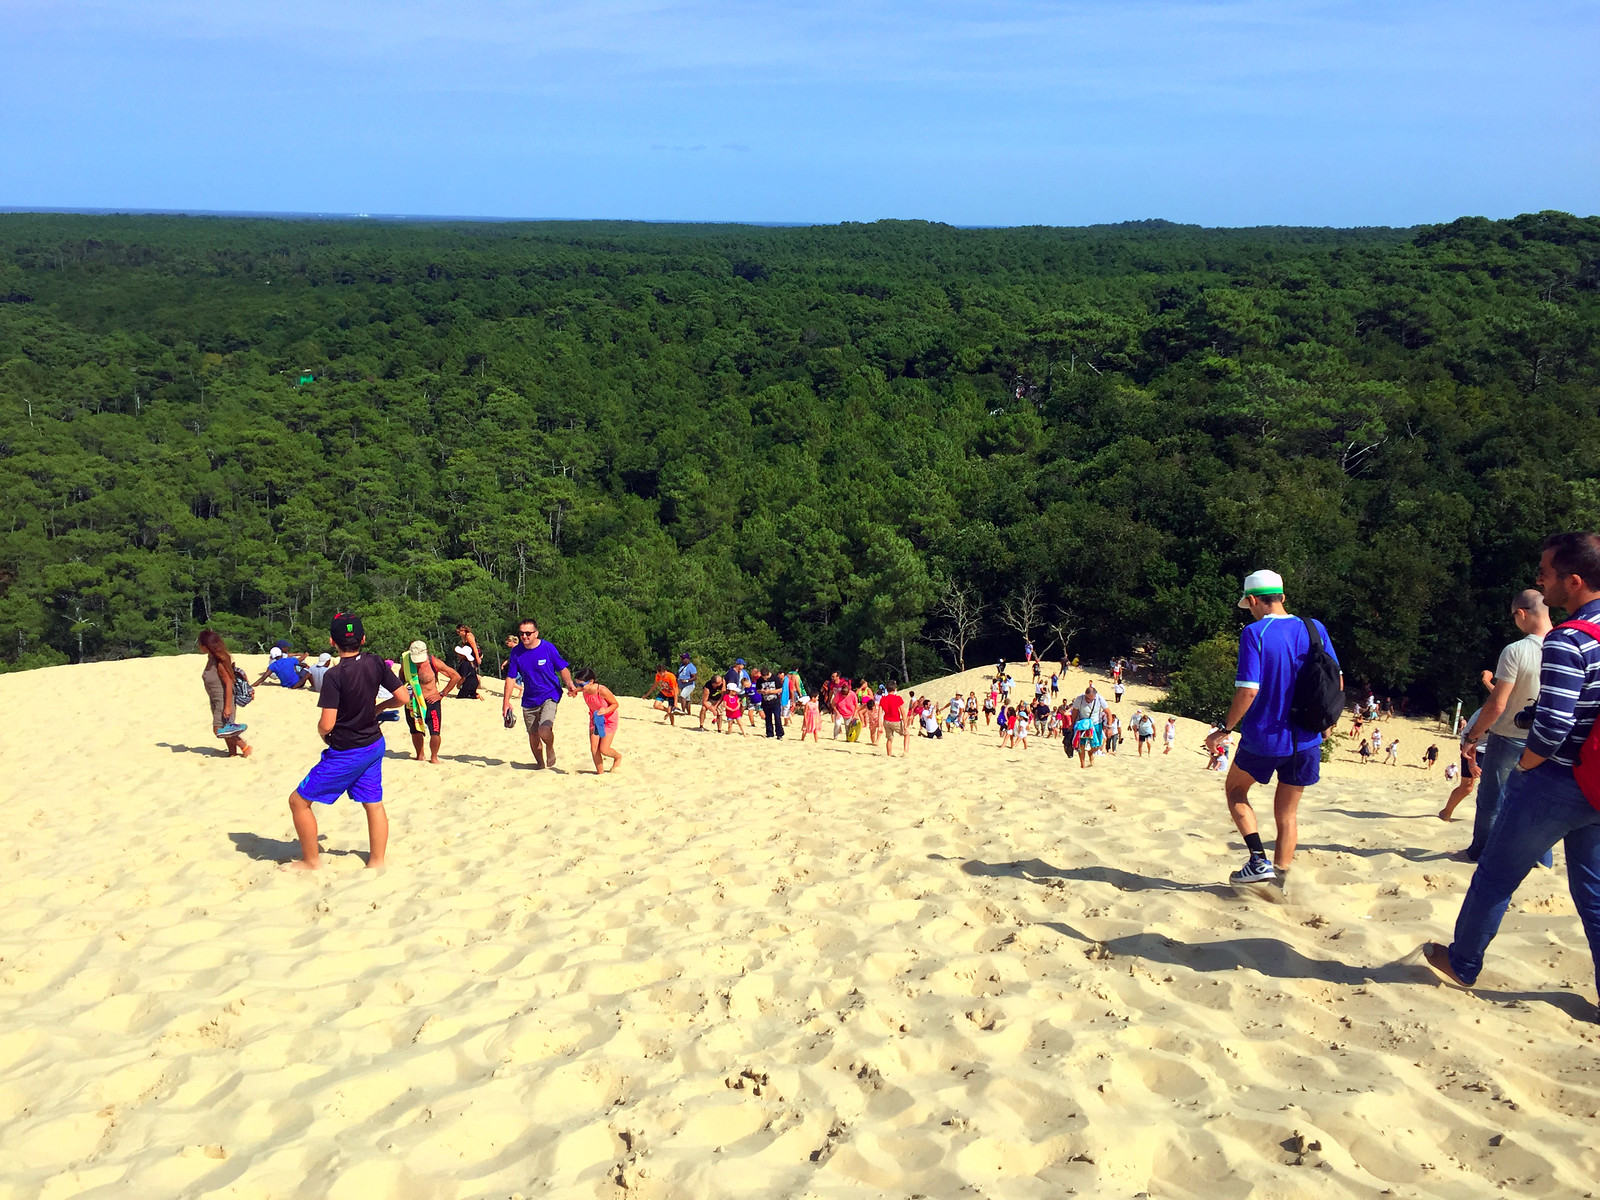 Dune du Pilat Francia Burdeos dune du pilat - 44217263880 99c2cc4132 h - Dune du Pilat, la duna de arena más alta de Europa